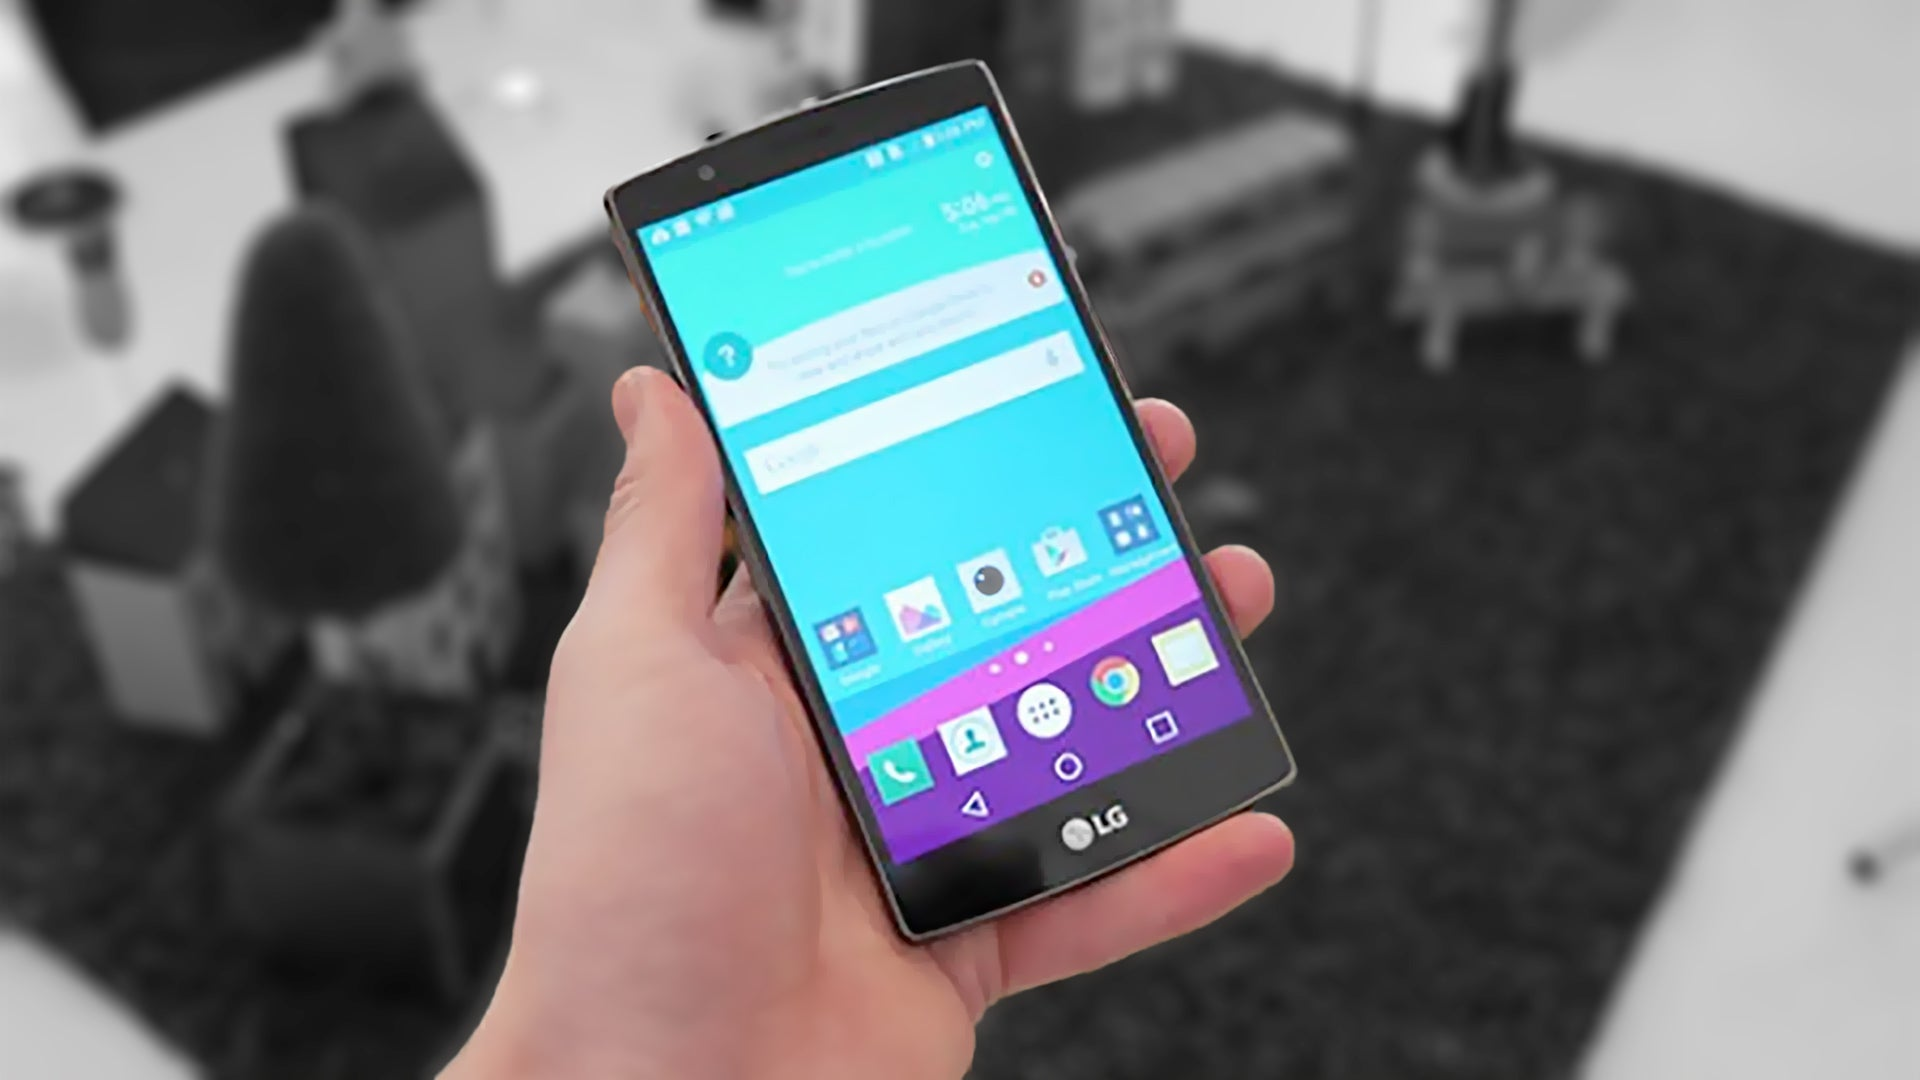 Kết quả hình ảnh cho LG G4 Bootloop Problem: Global Software Upgrade Centre the final fix?